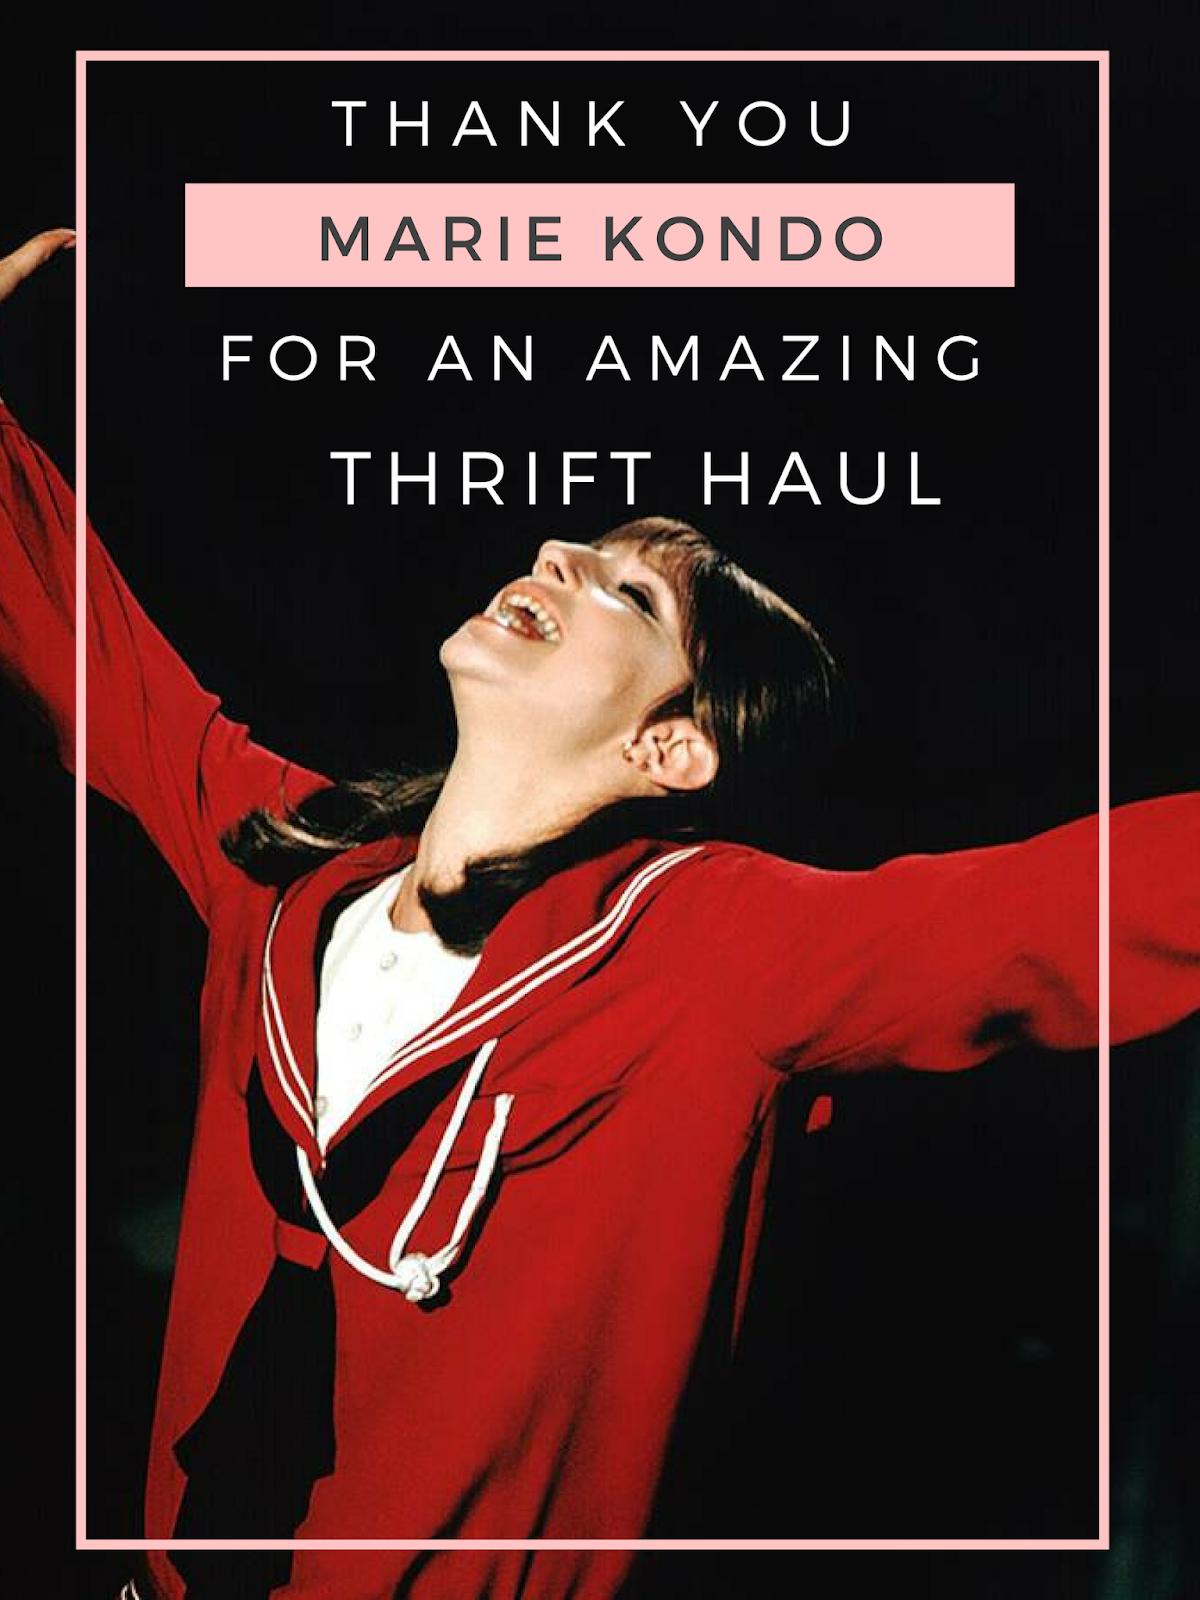 marie-kondo-thrift-haul